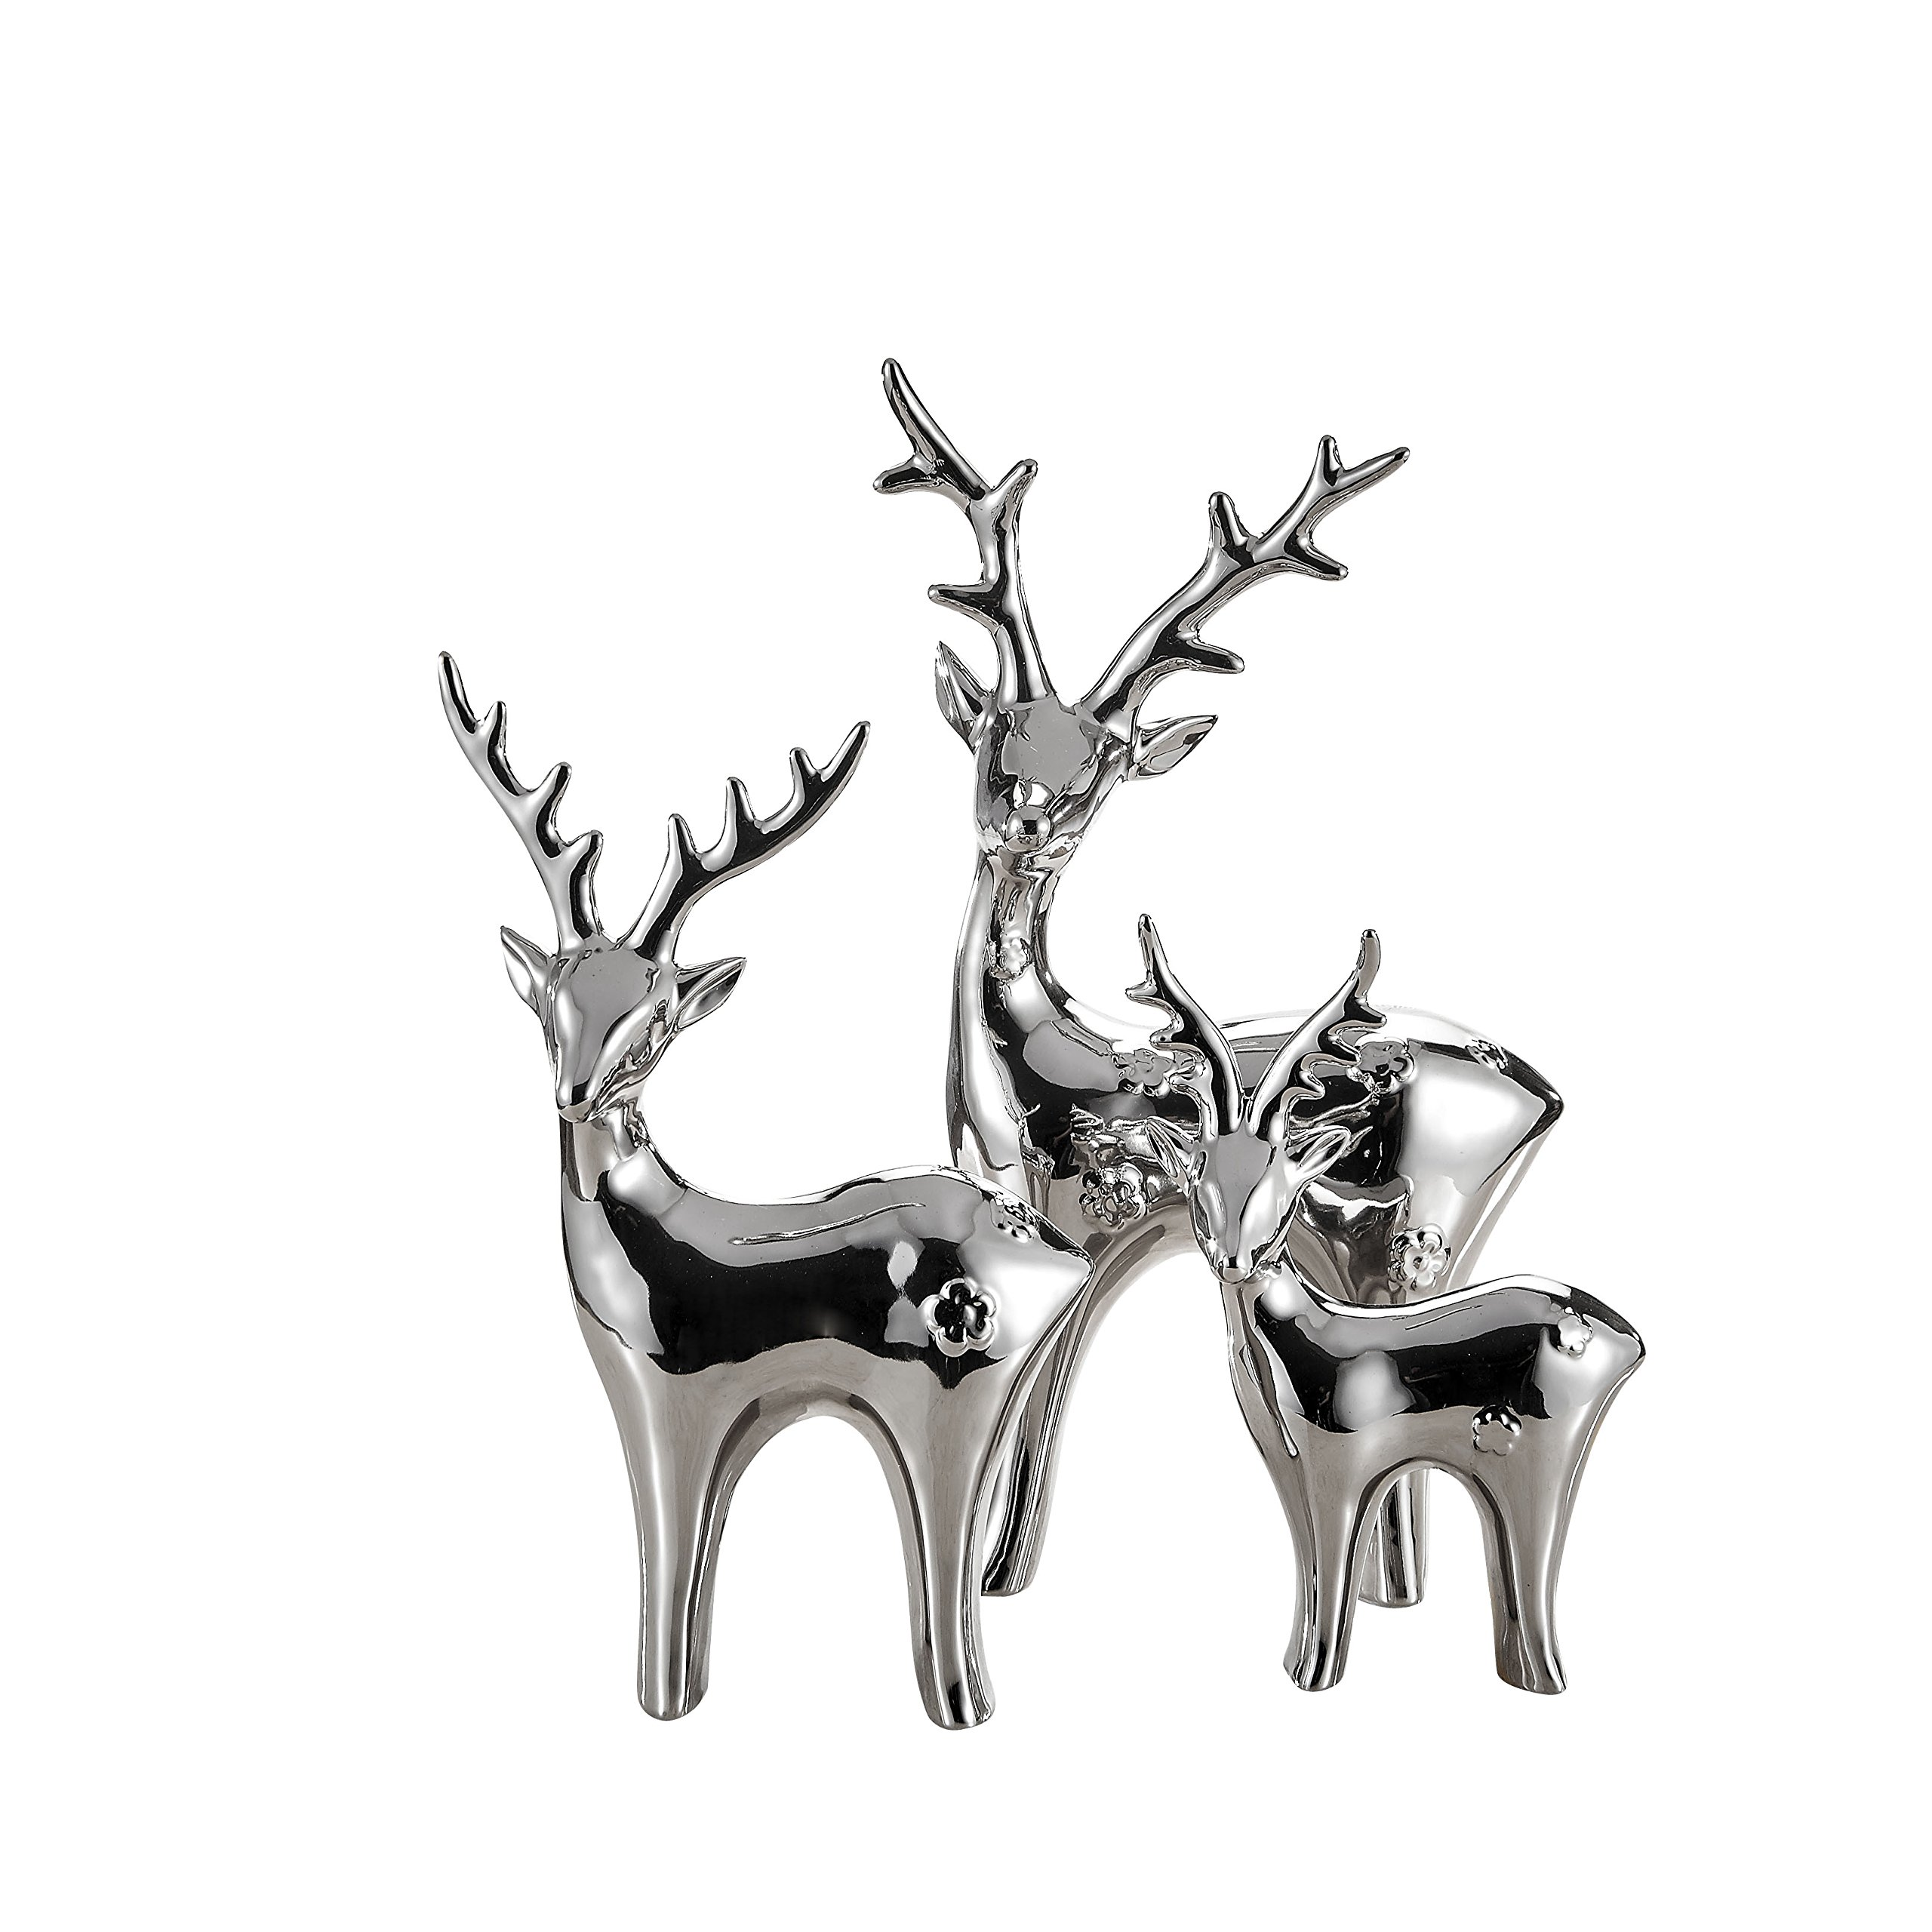 Pure.Lifestyle Reindeers Electroplated Polished Chrome Ceramic Decoration Animals Figurine Milu Deer's Porcelain Sculptures Elks Statues Moose, Silver